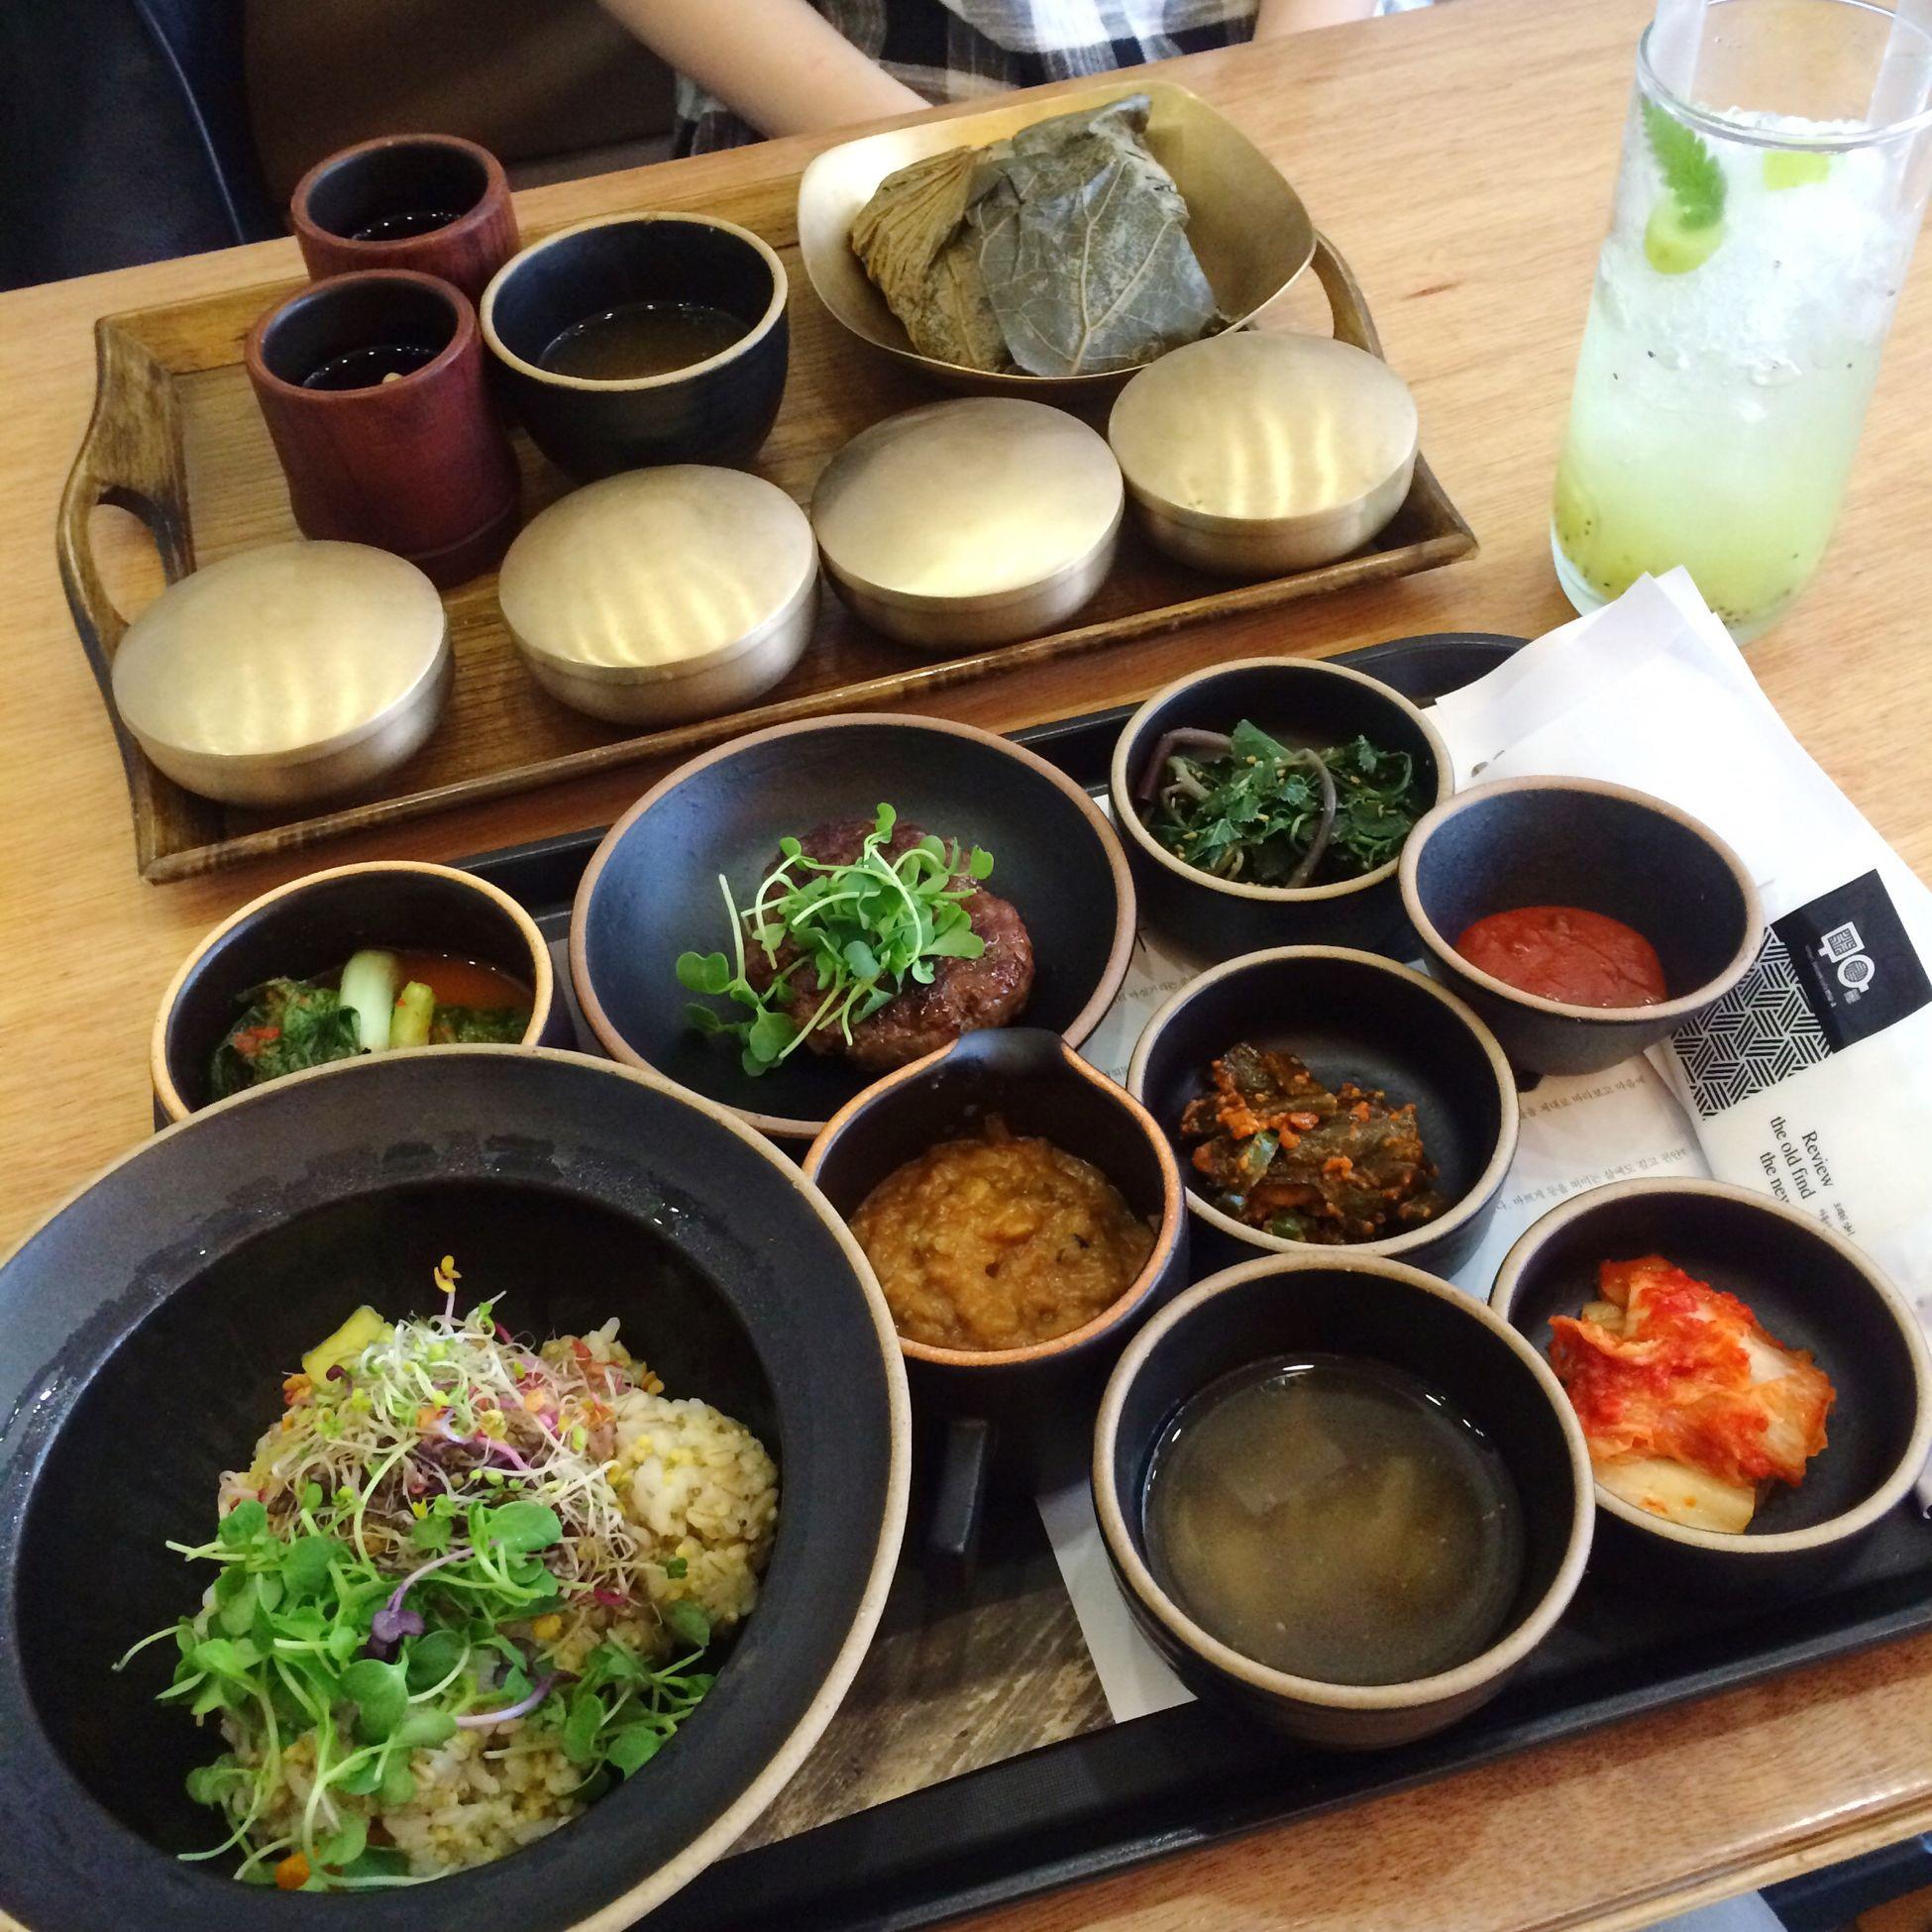 Korean Food Korean Restaurant Daegu Cafemul-a